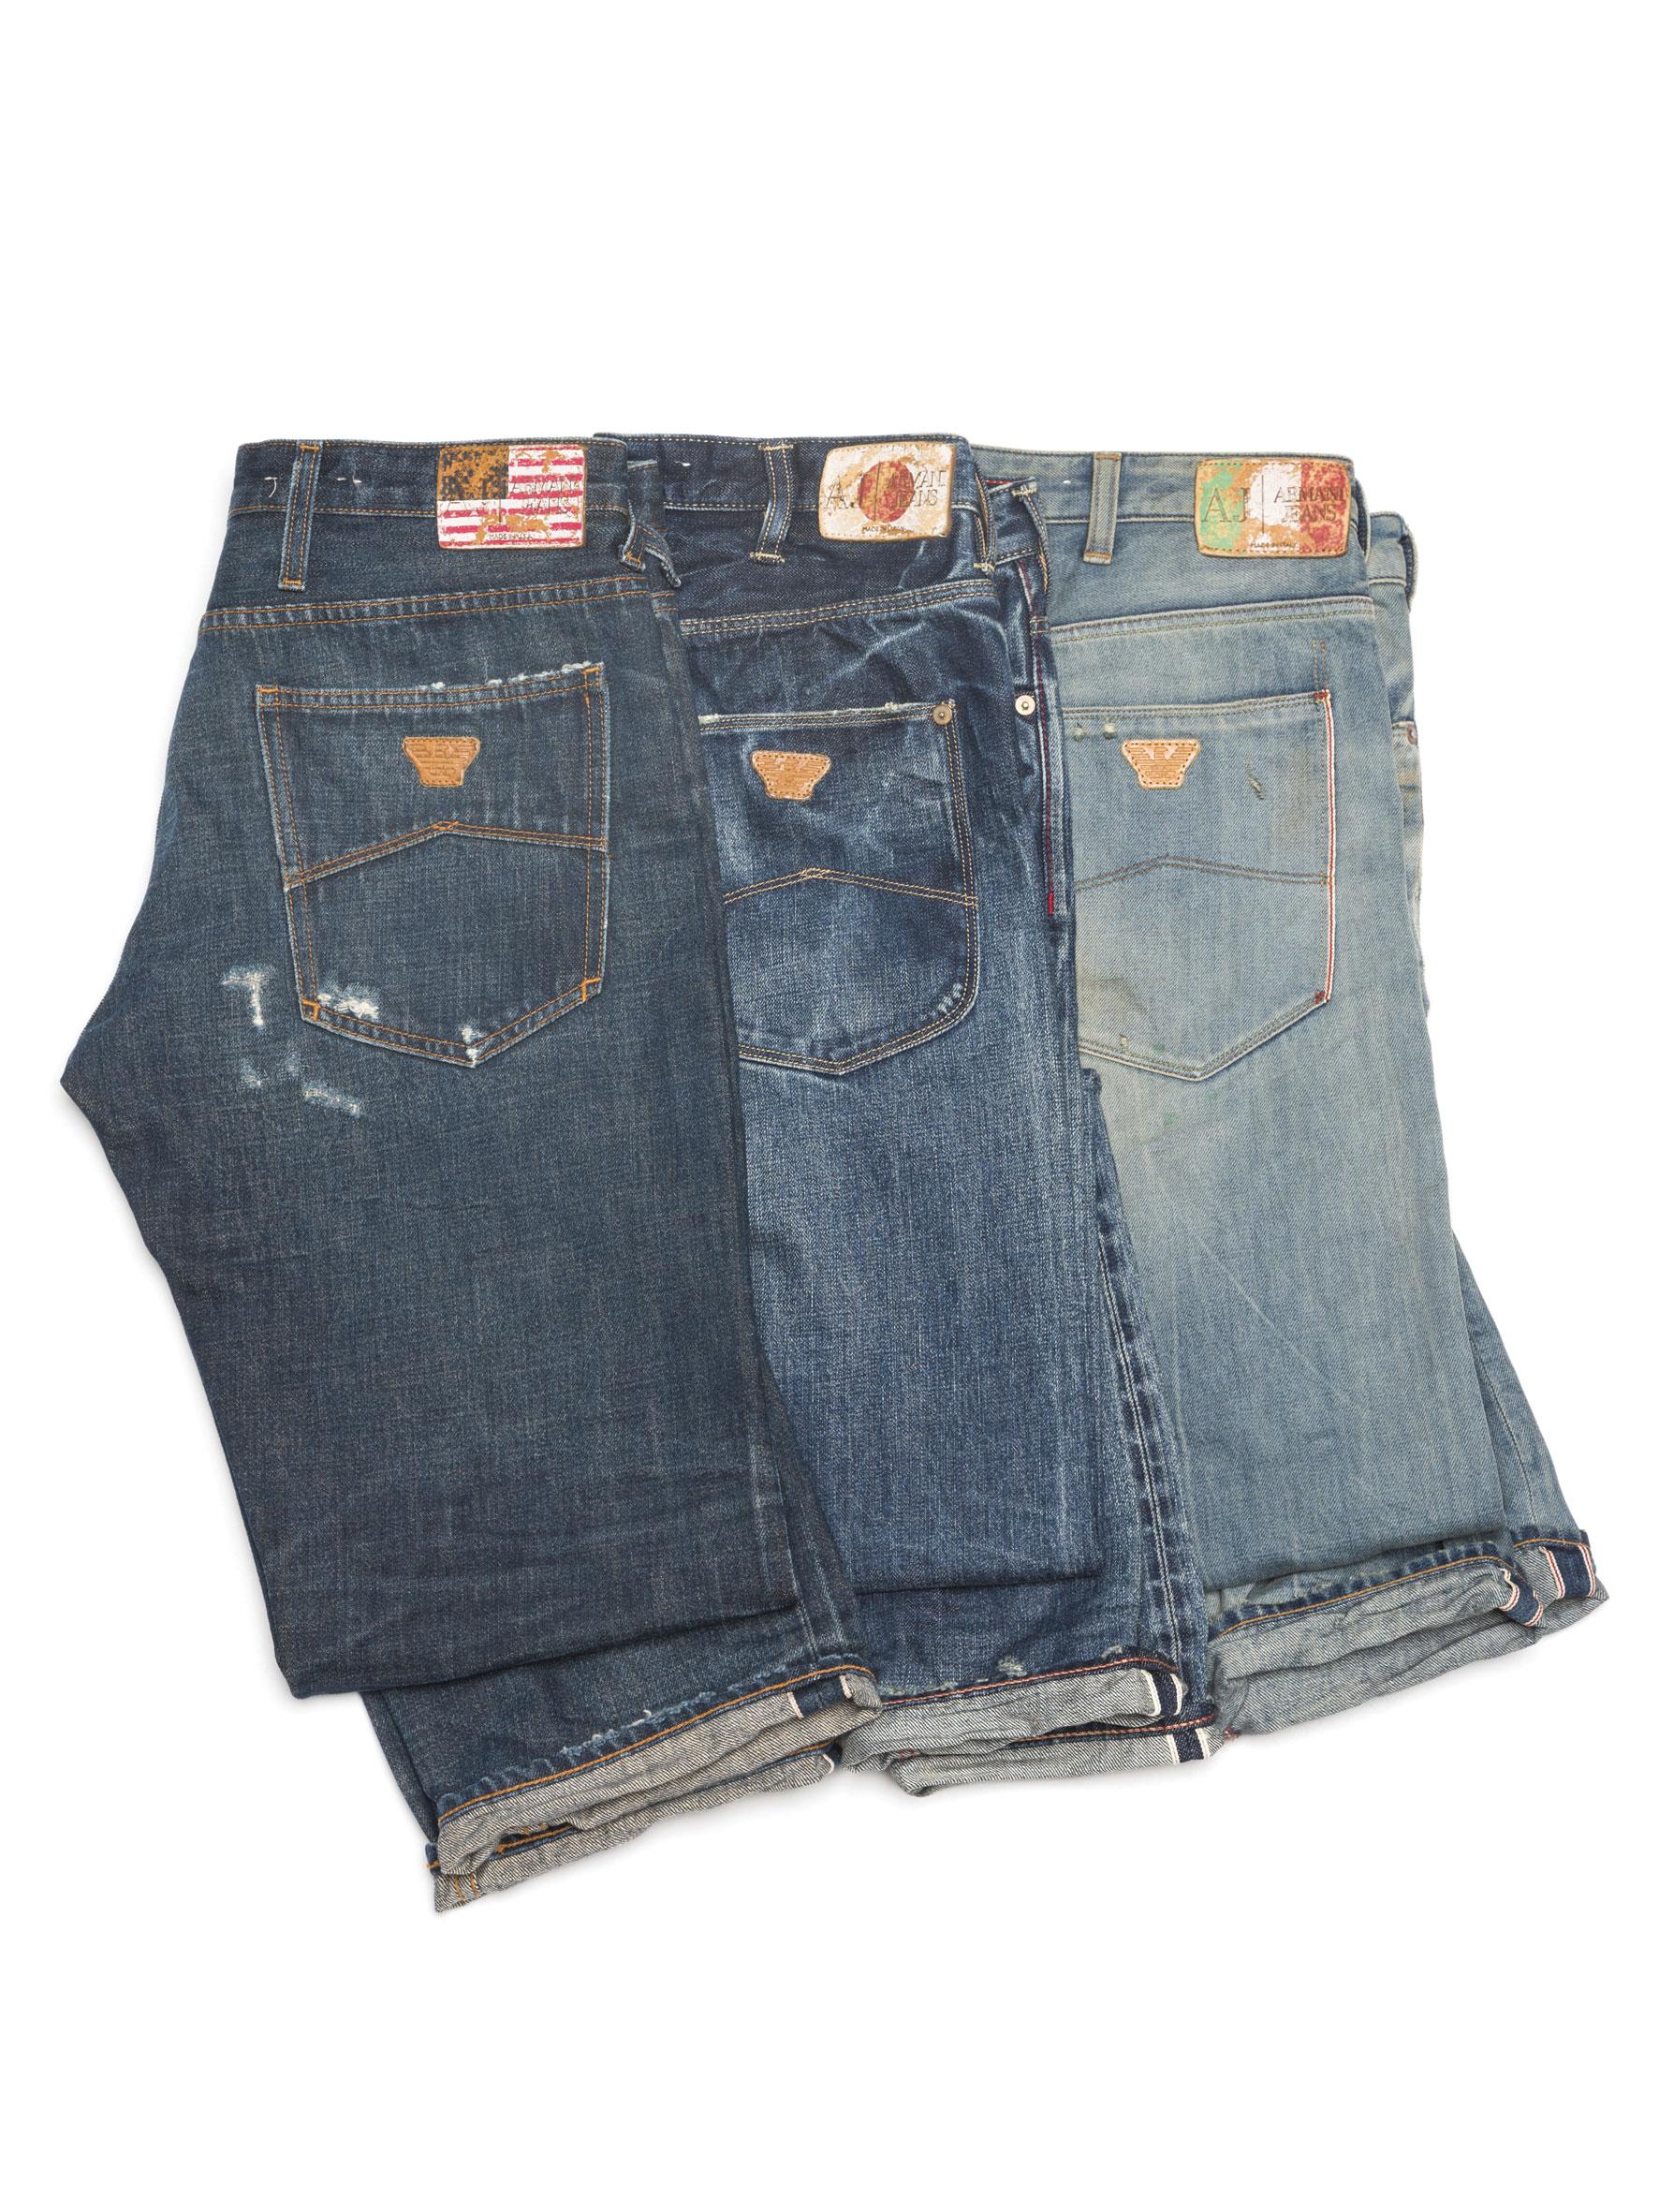 essentials armani jeans da man magazine. Black Bedroom Furniture Sets. Home Design Ideas